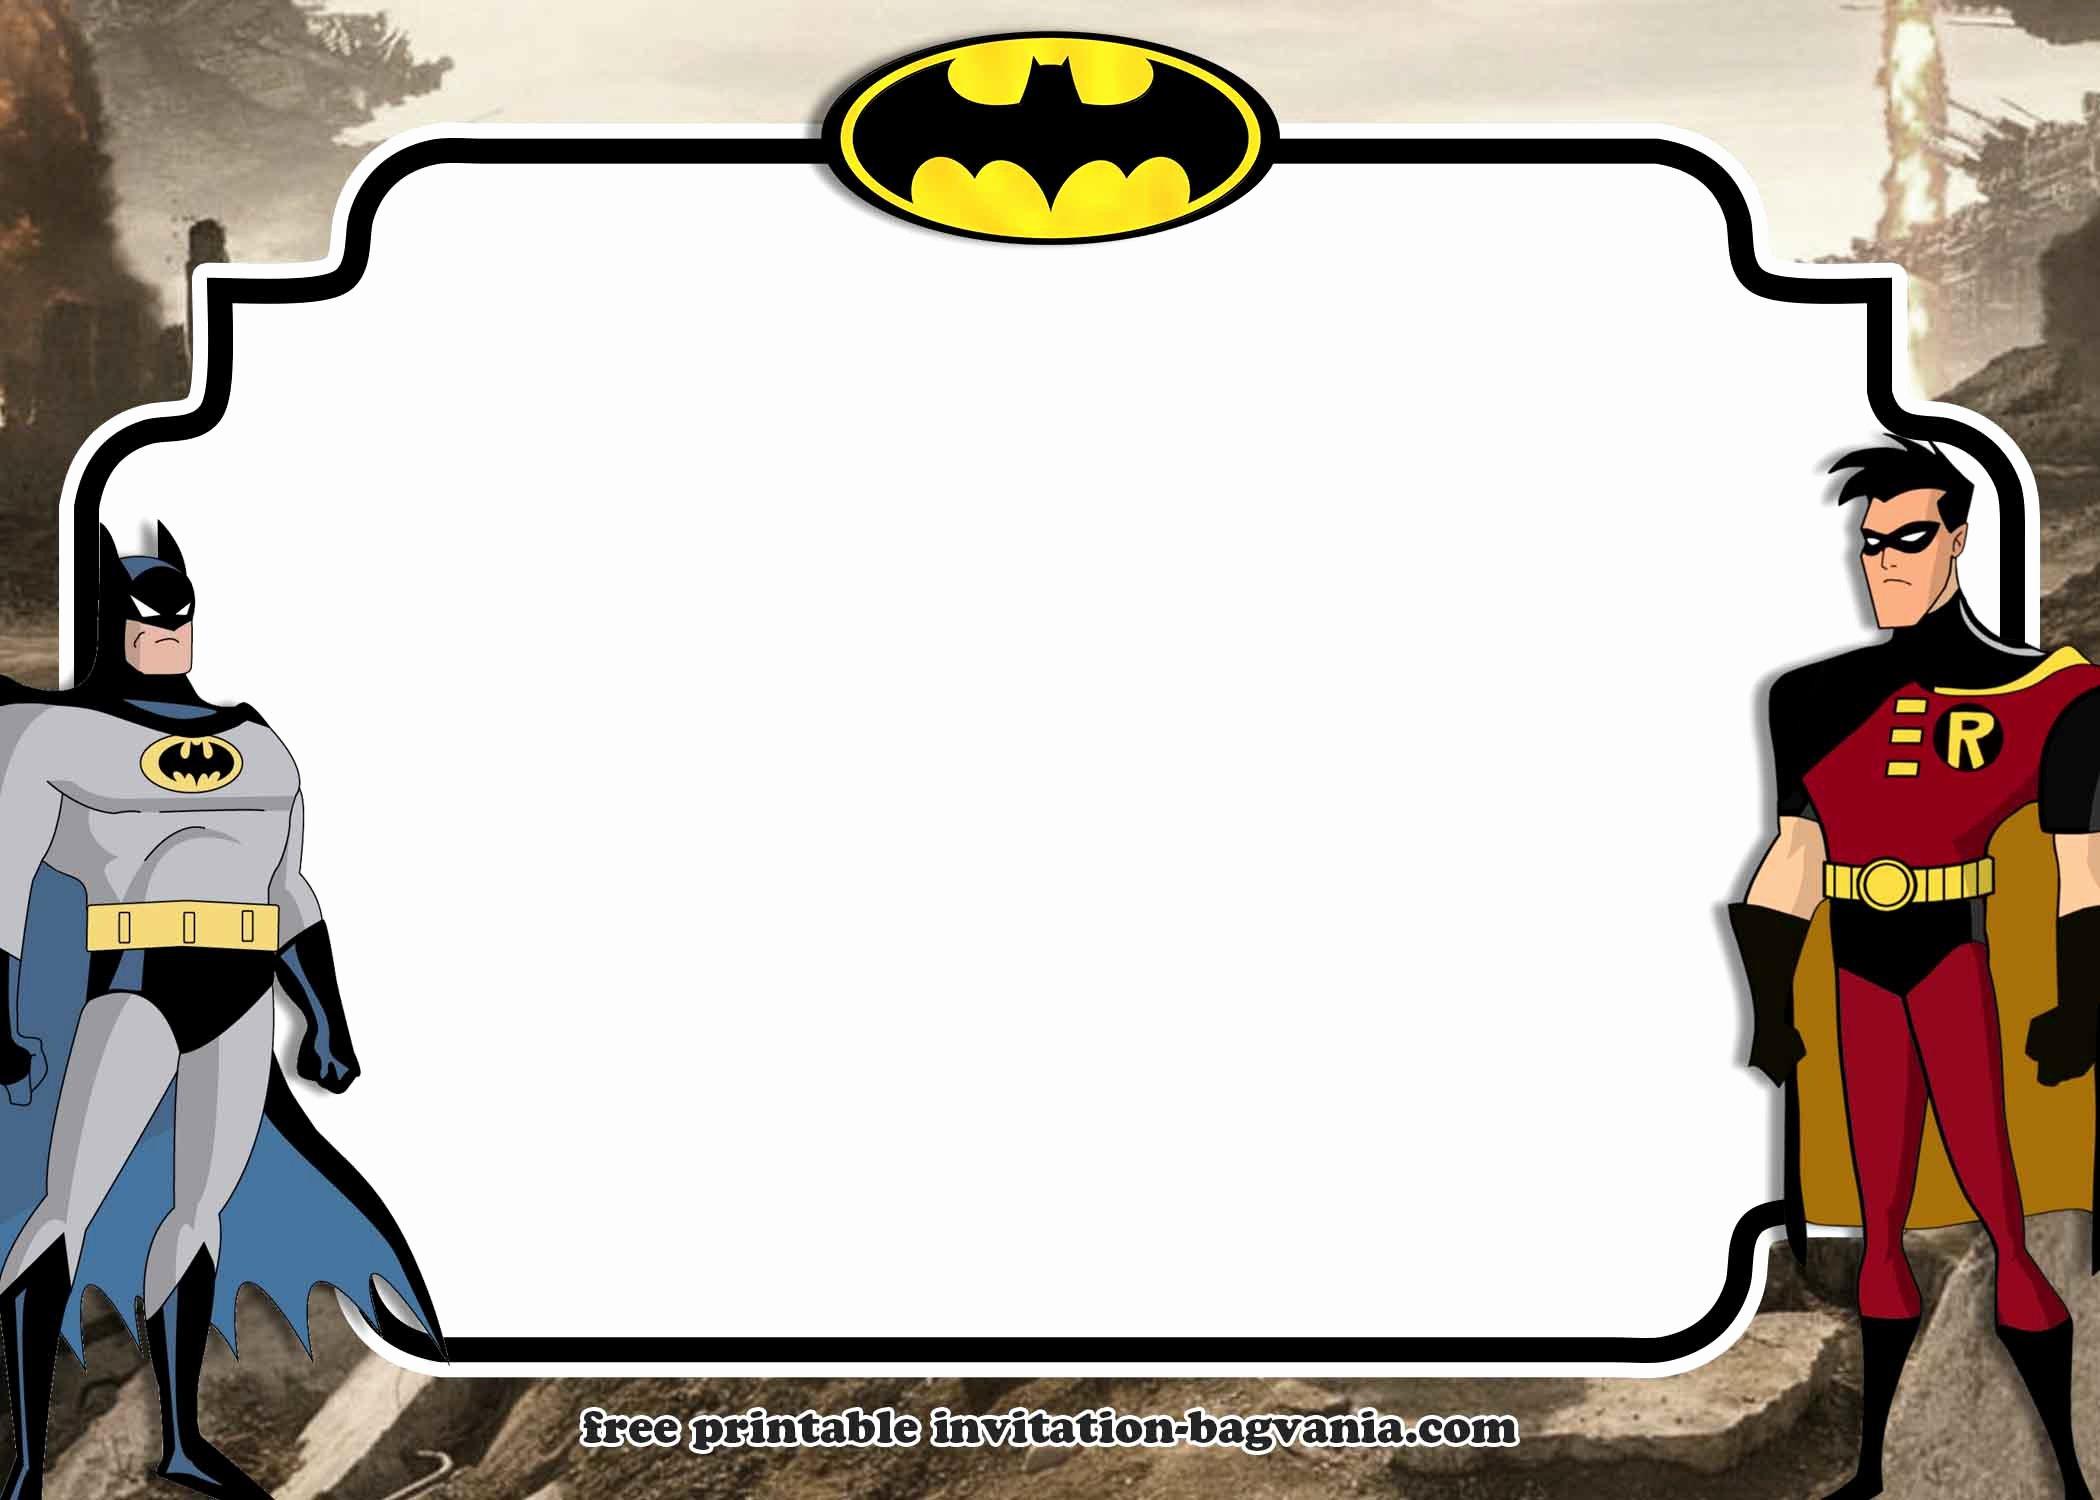 Free Batman Invitation Template Luxury Free Printable Batman Invitation Templates – Free